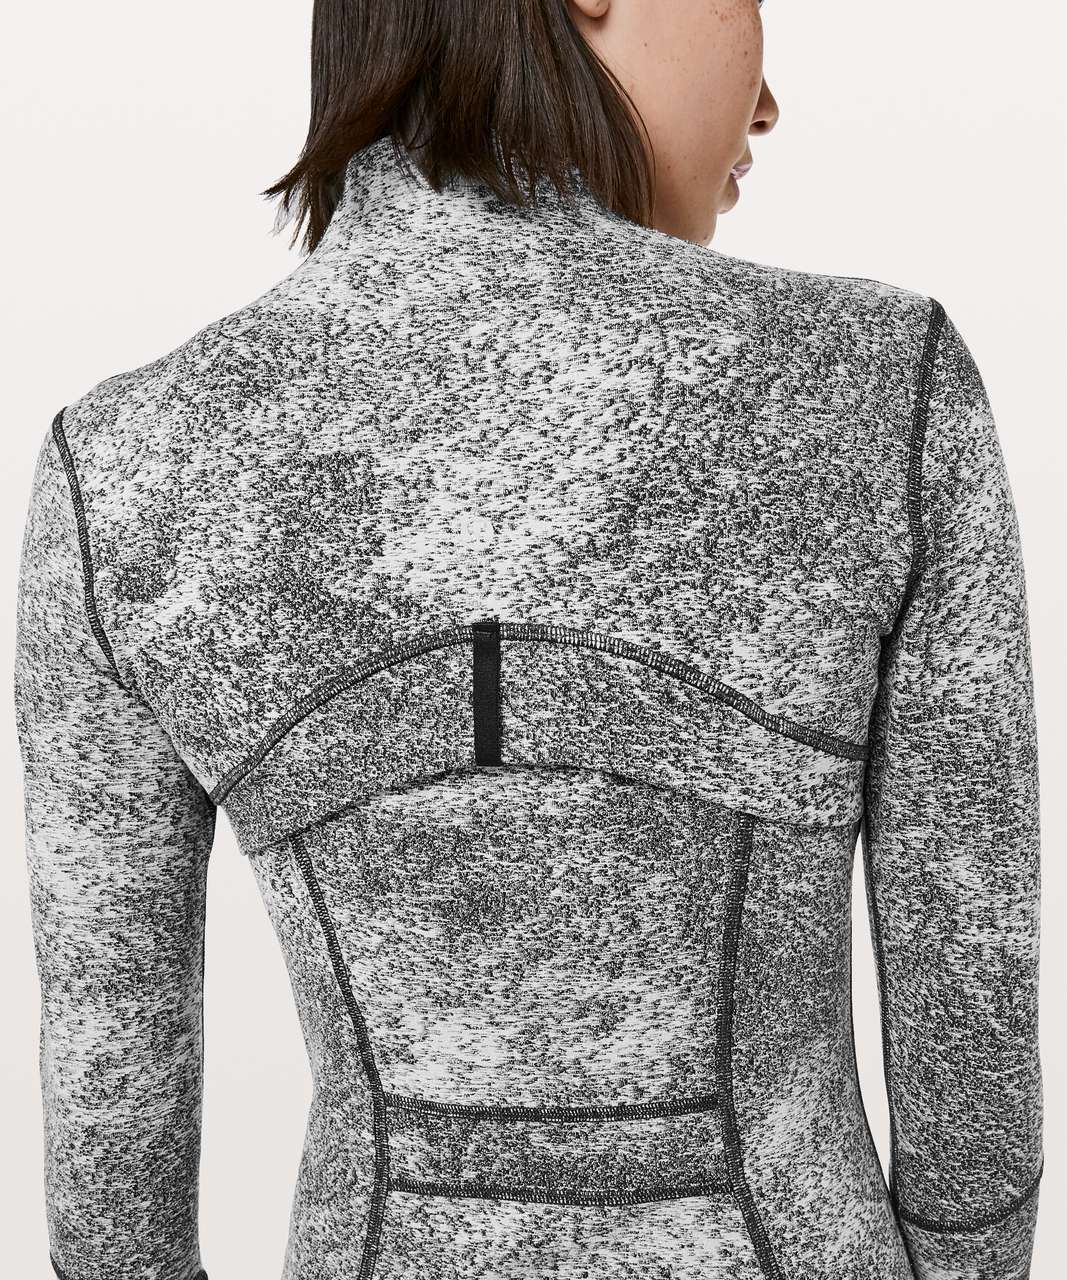 Lululemon Define Jacket - Luon Spray Jacquard White Black